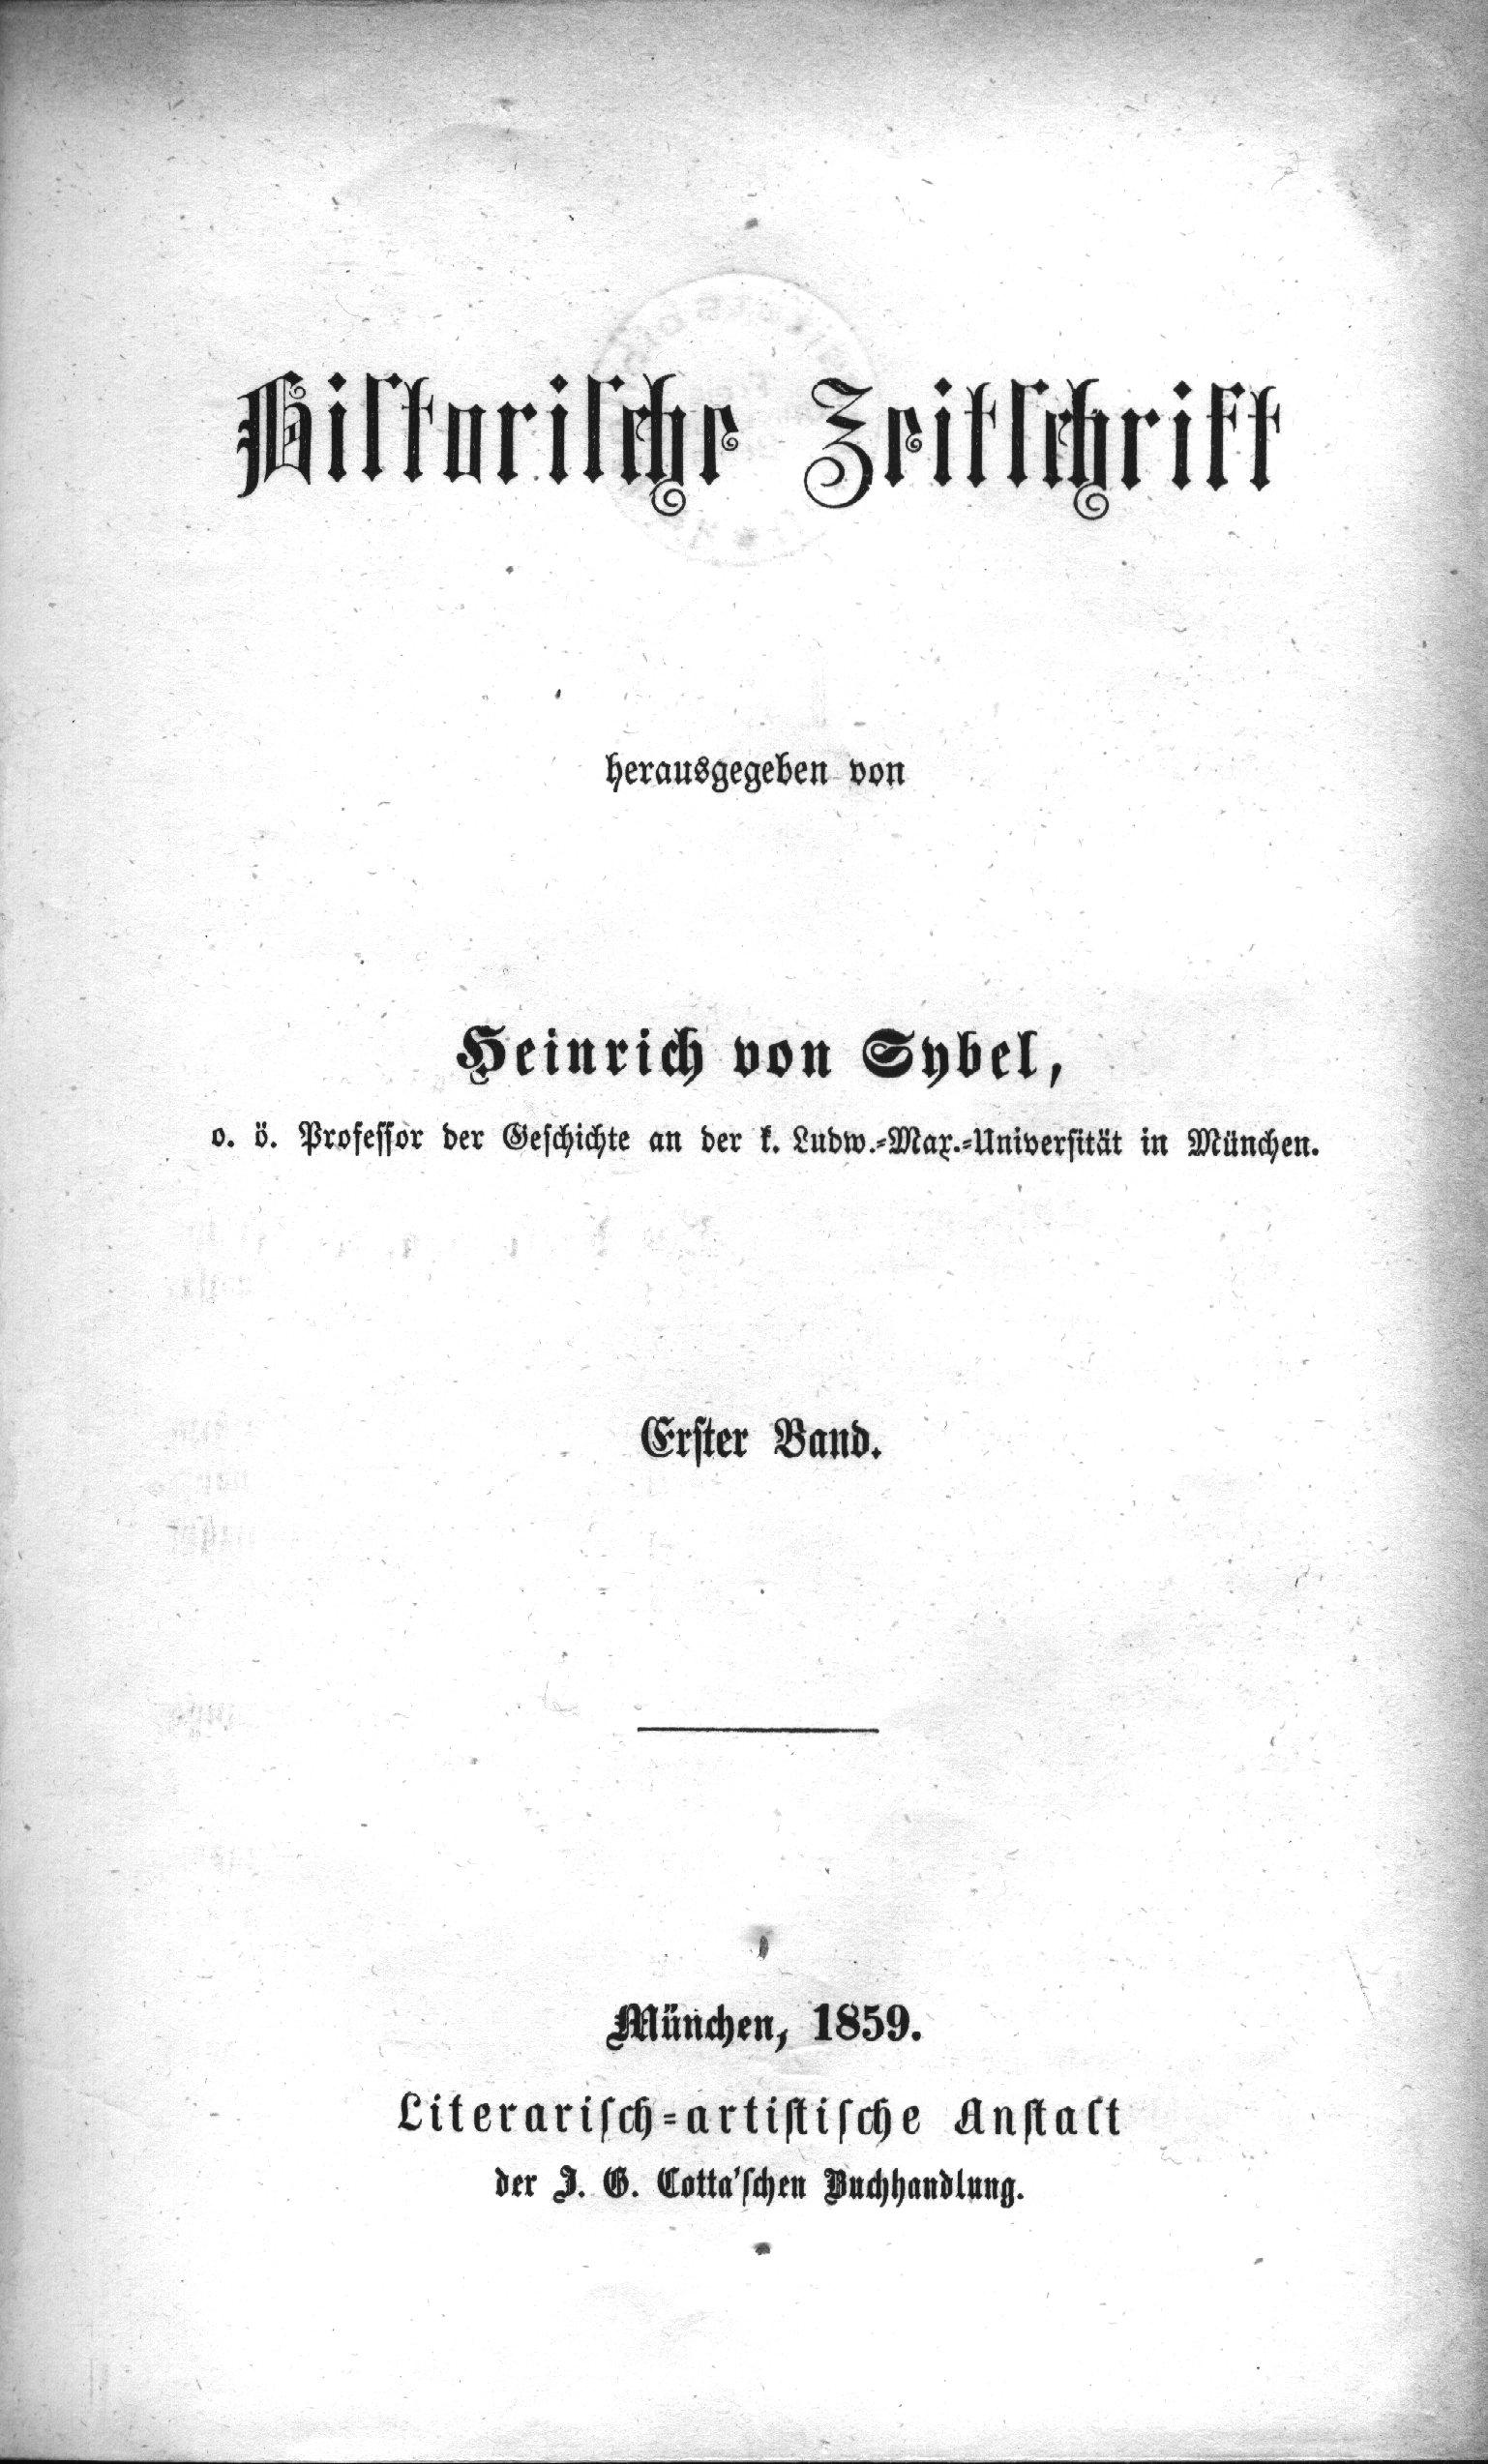 Journal Of World History